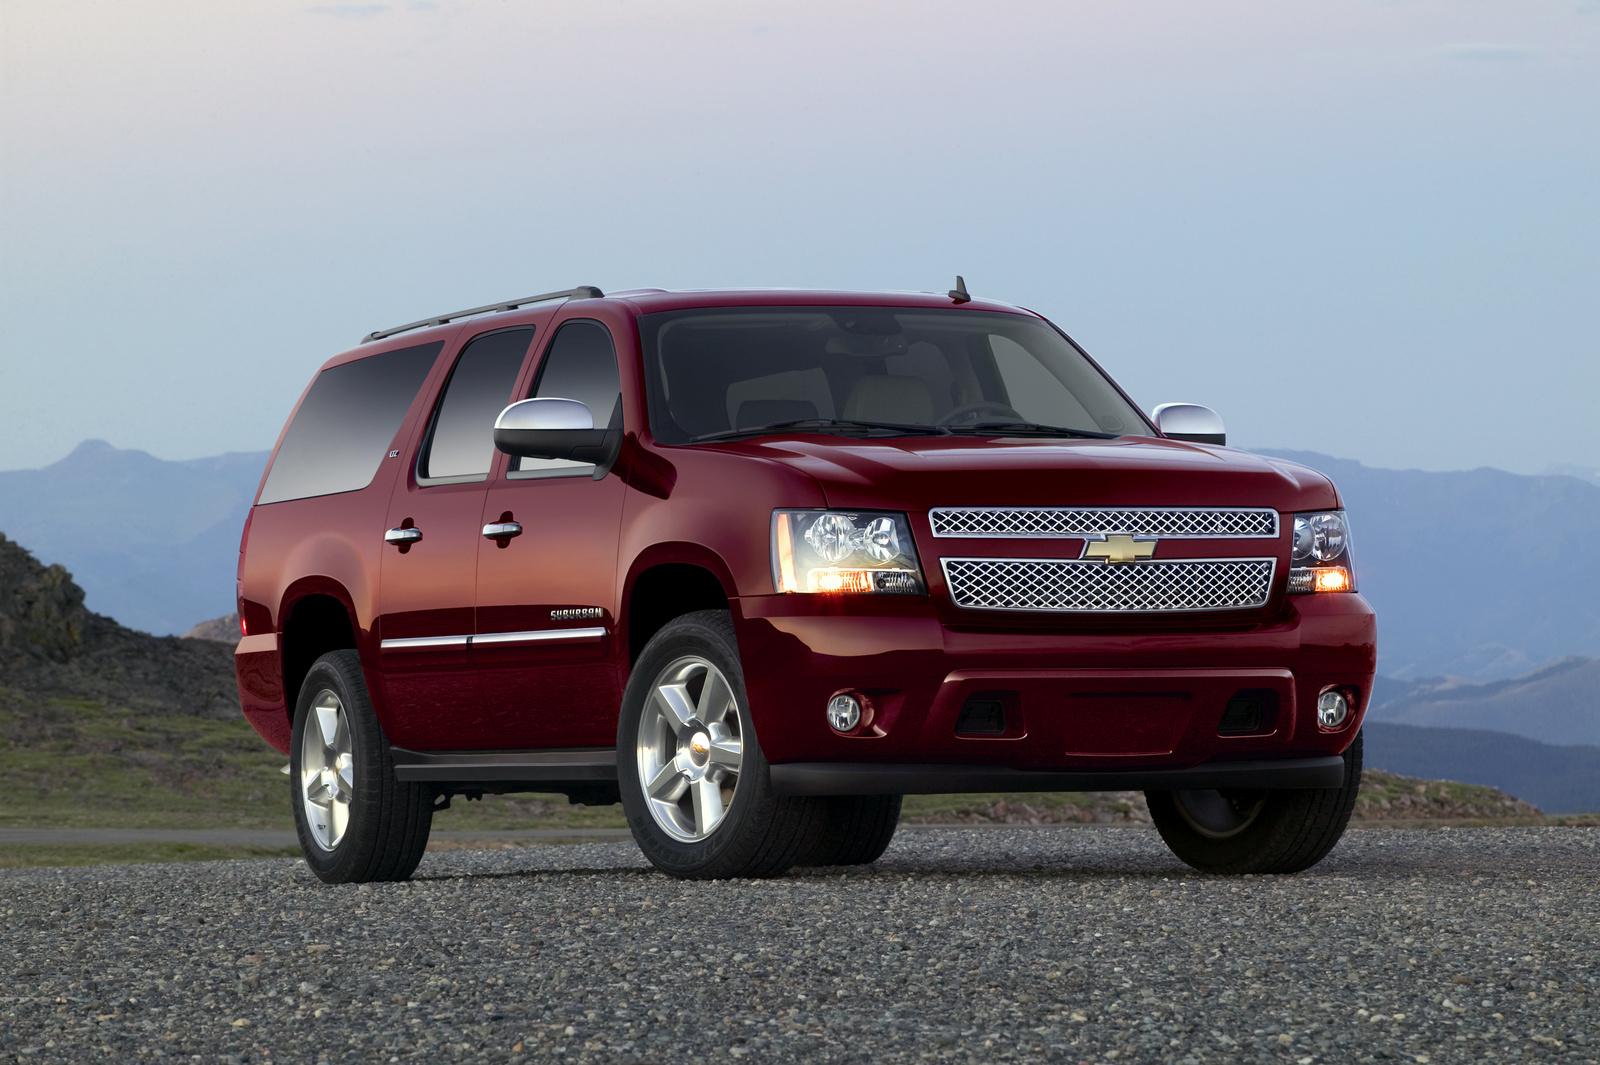 2013 Chevrolet Suburban Test Drive Review - CarGurus